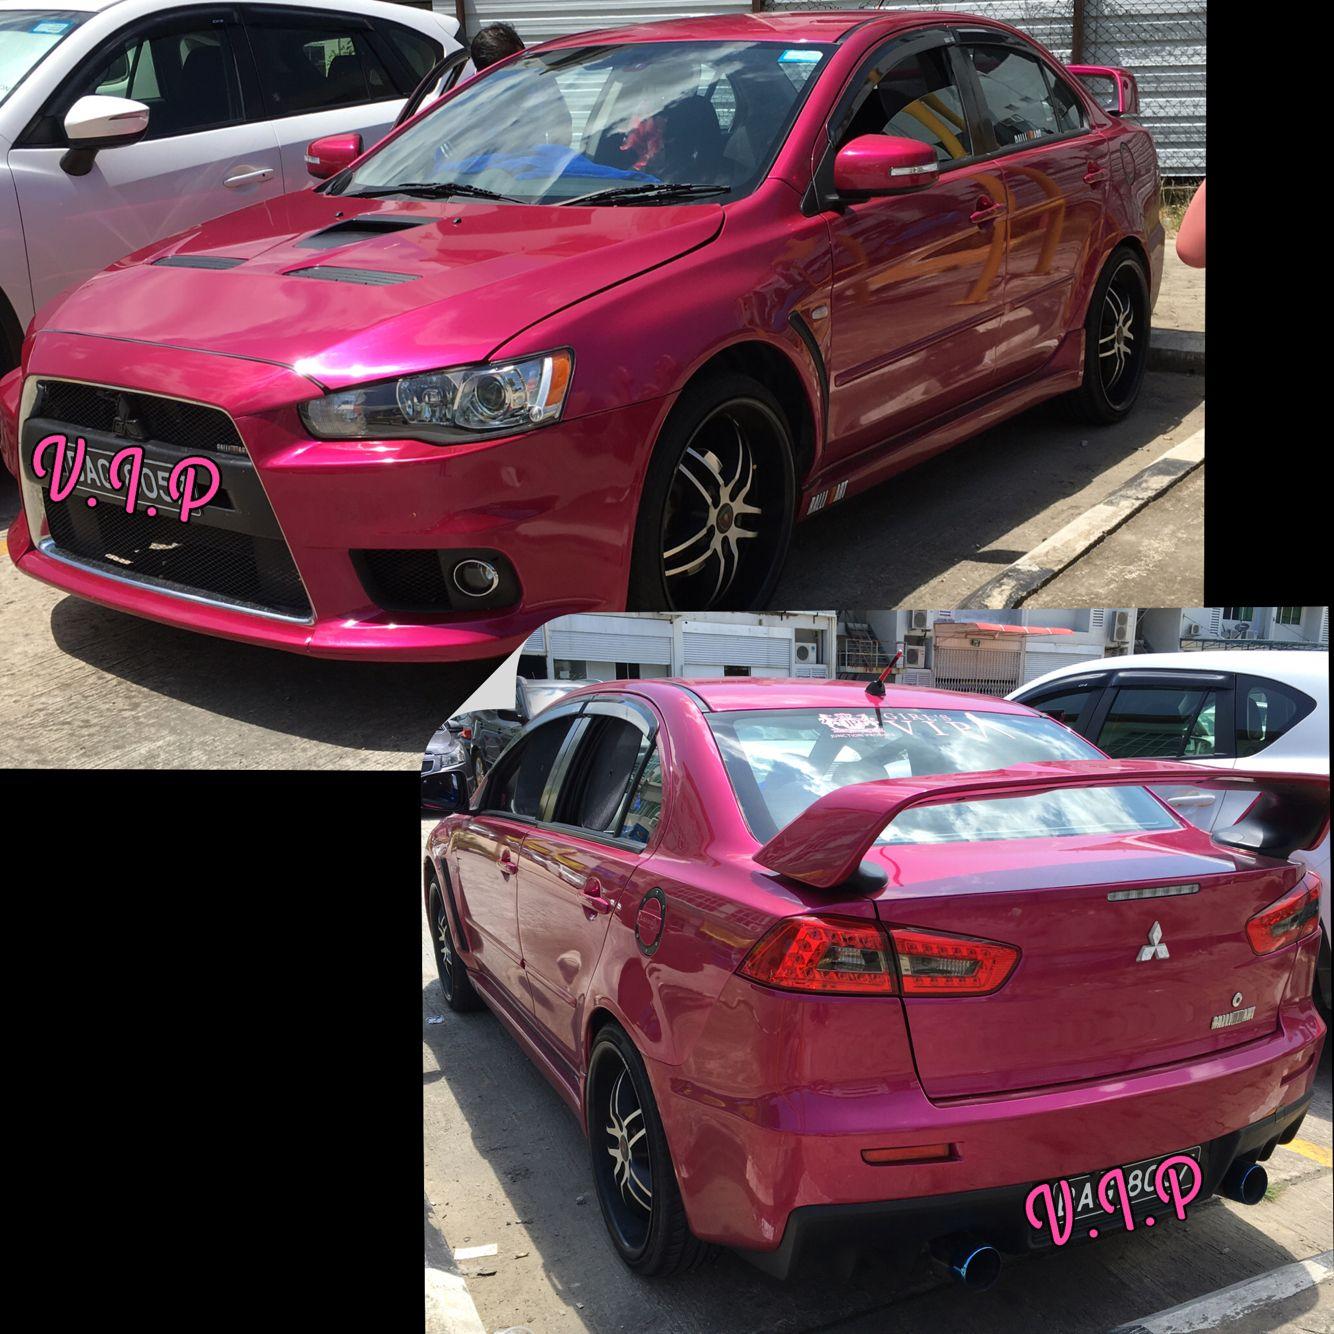 My Pink Mitsubishi Lancer Ex Gt My Ride Mitsubishilancerex Lancerex Mitsubishi Pinknation Pinkaholic Pink Mitsubishi Lancer Lancer Dream Cars